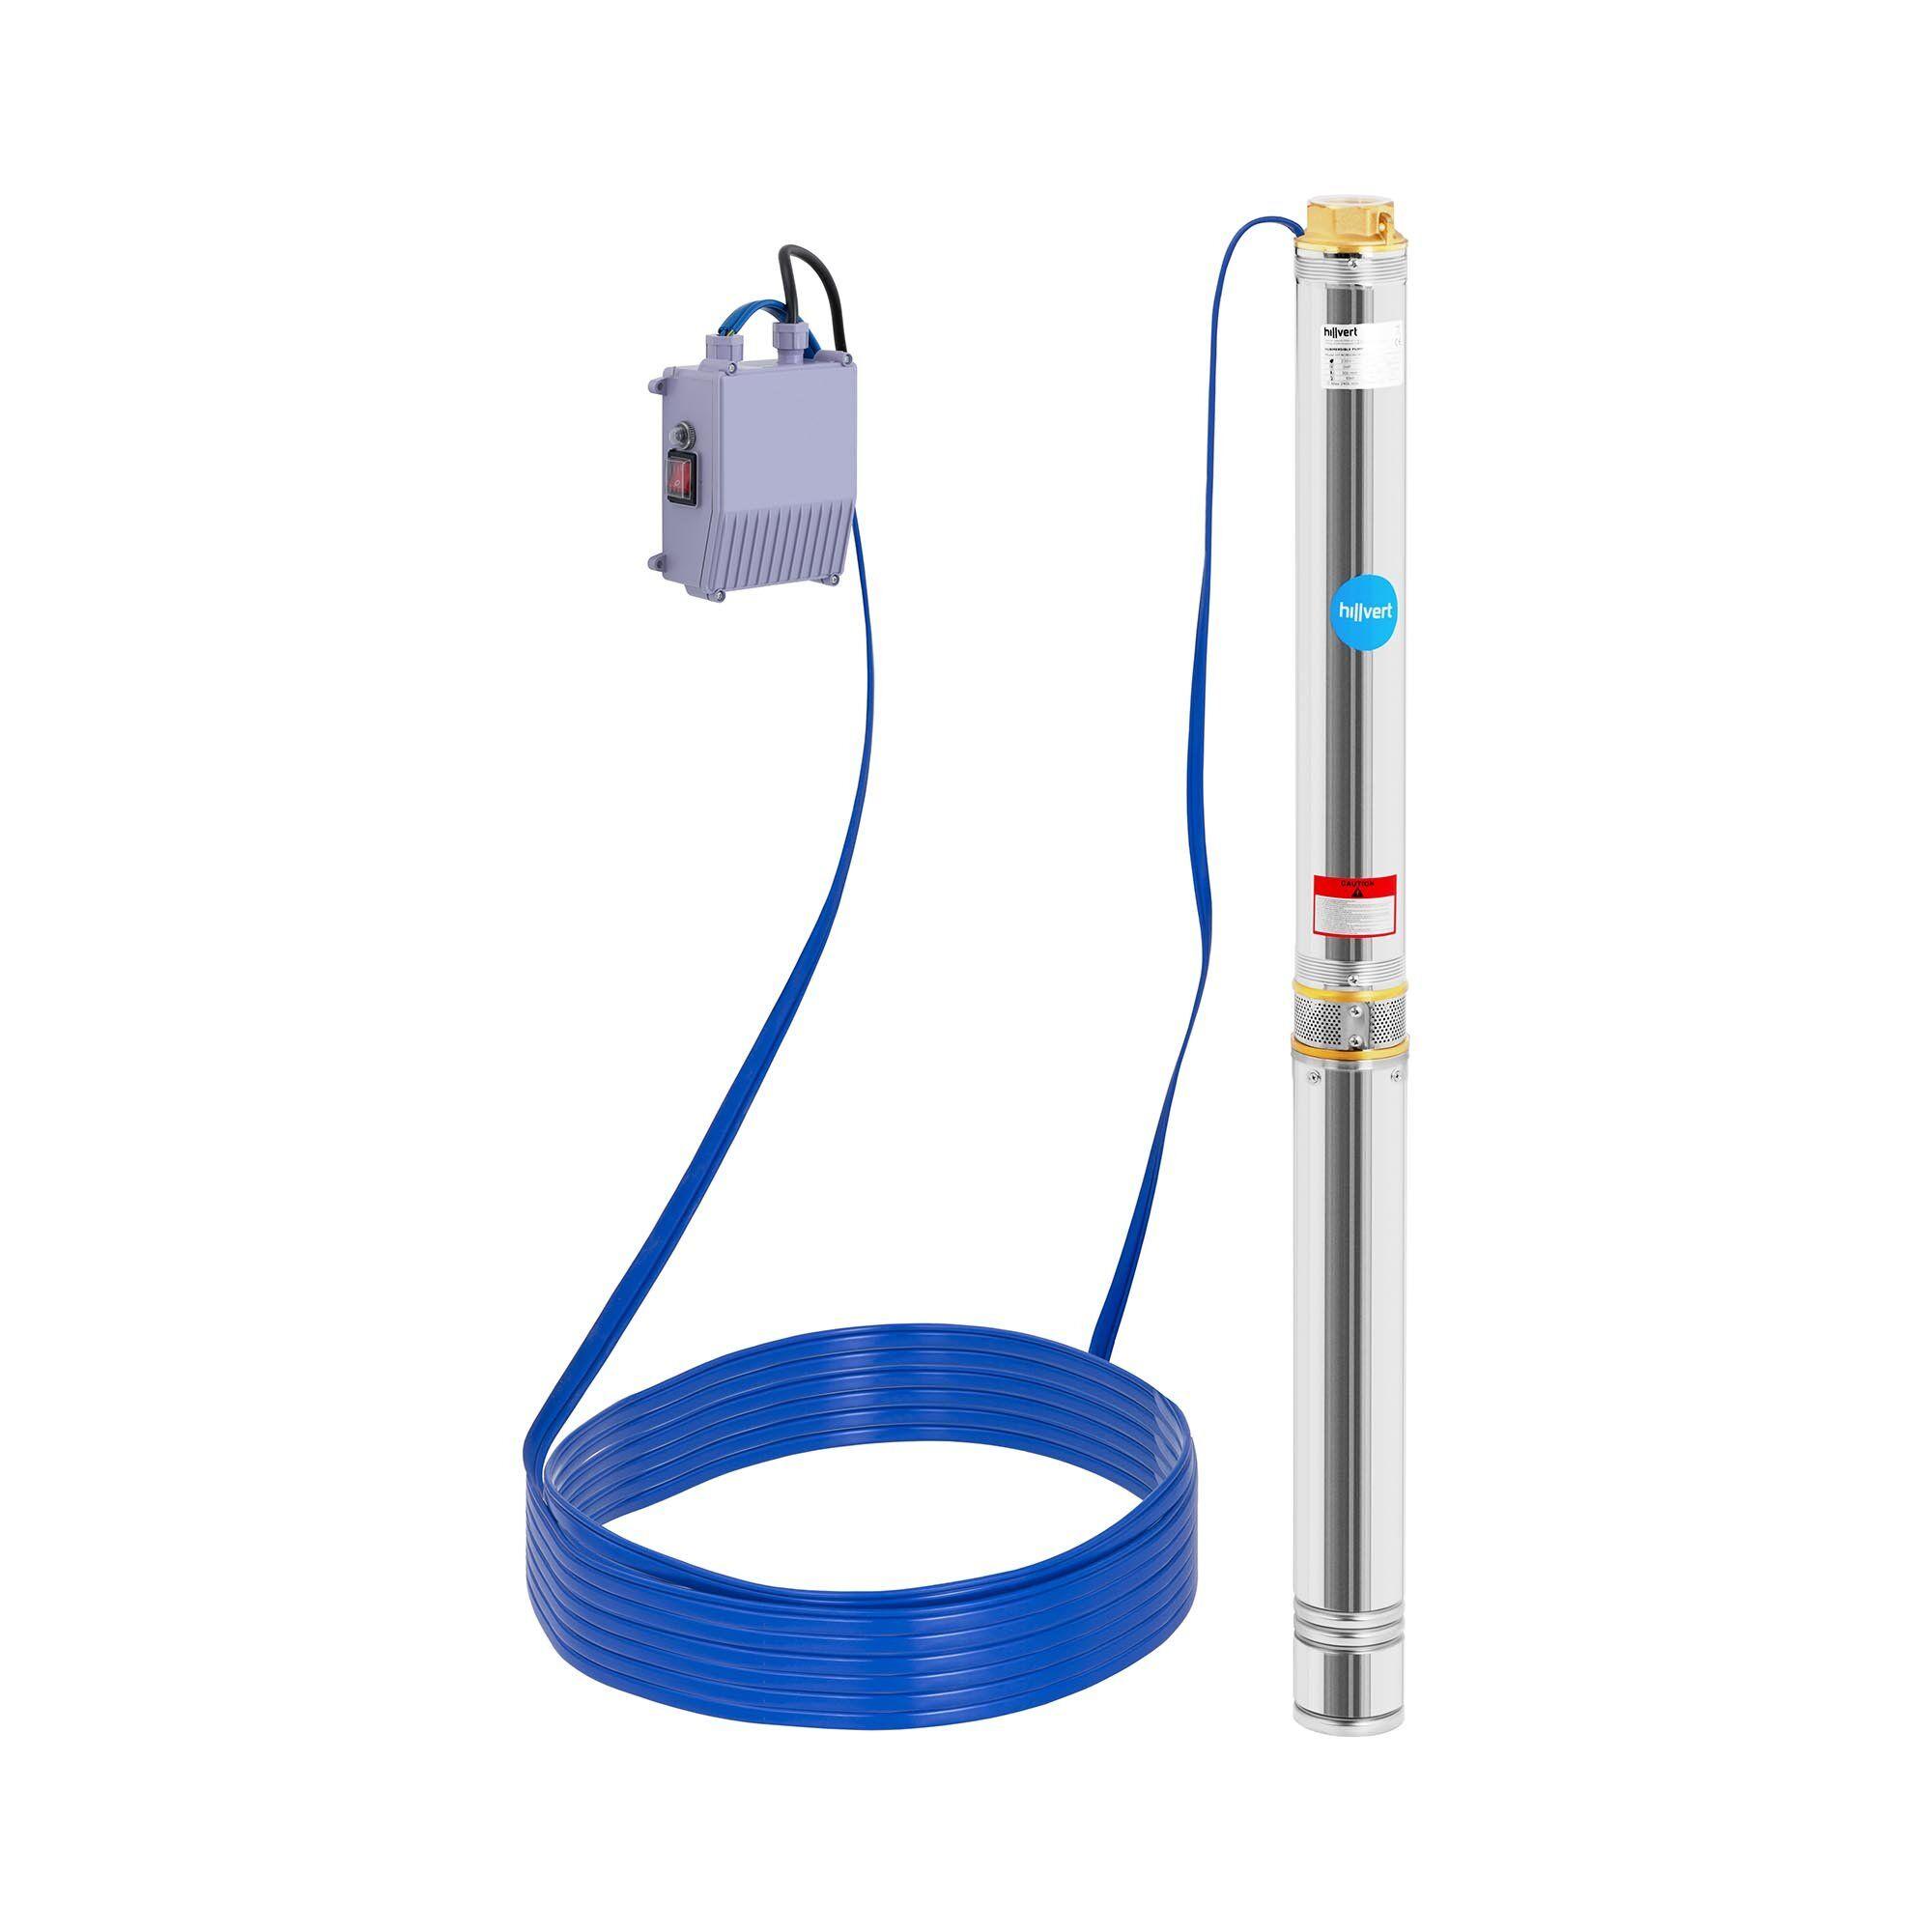 hillvert pompa sommersa per pozzo - 9.000 l/h - 2.200 w ht-robson-sp2200-72